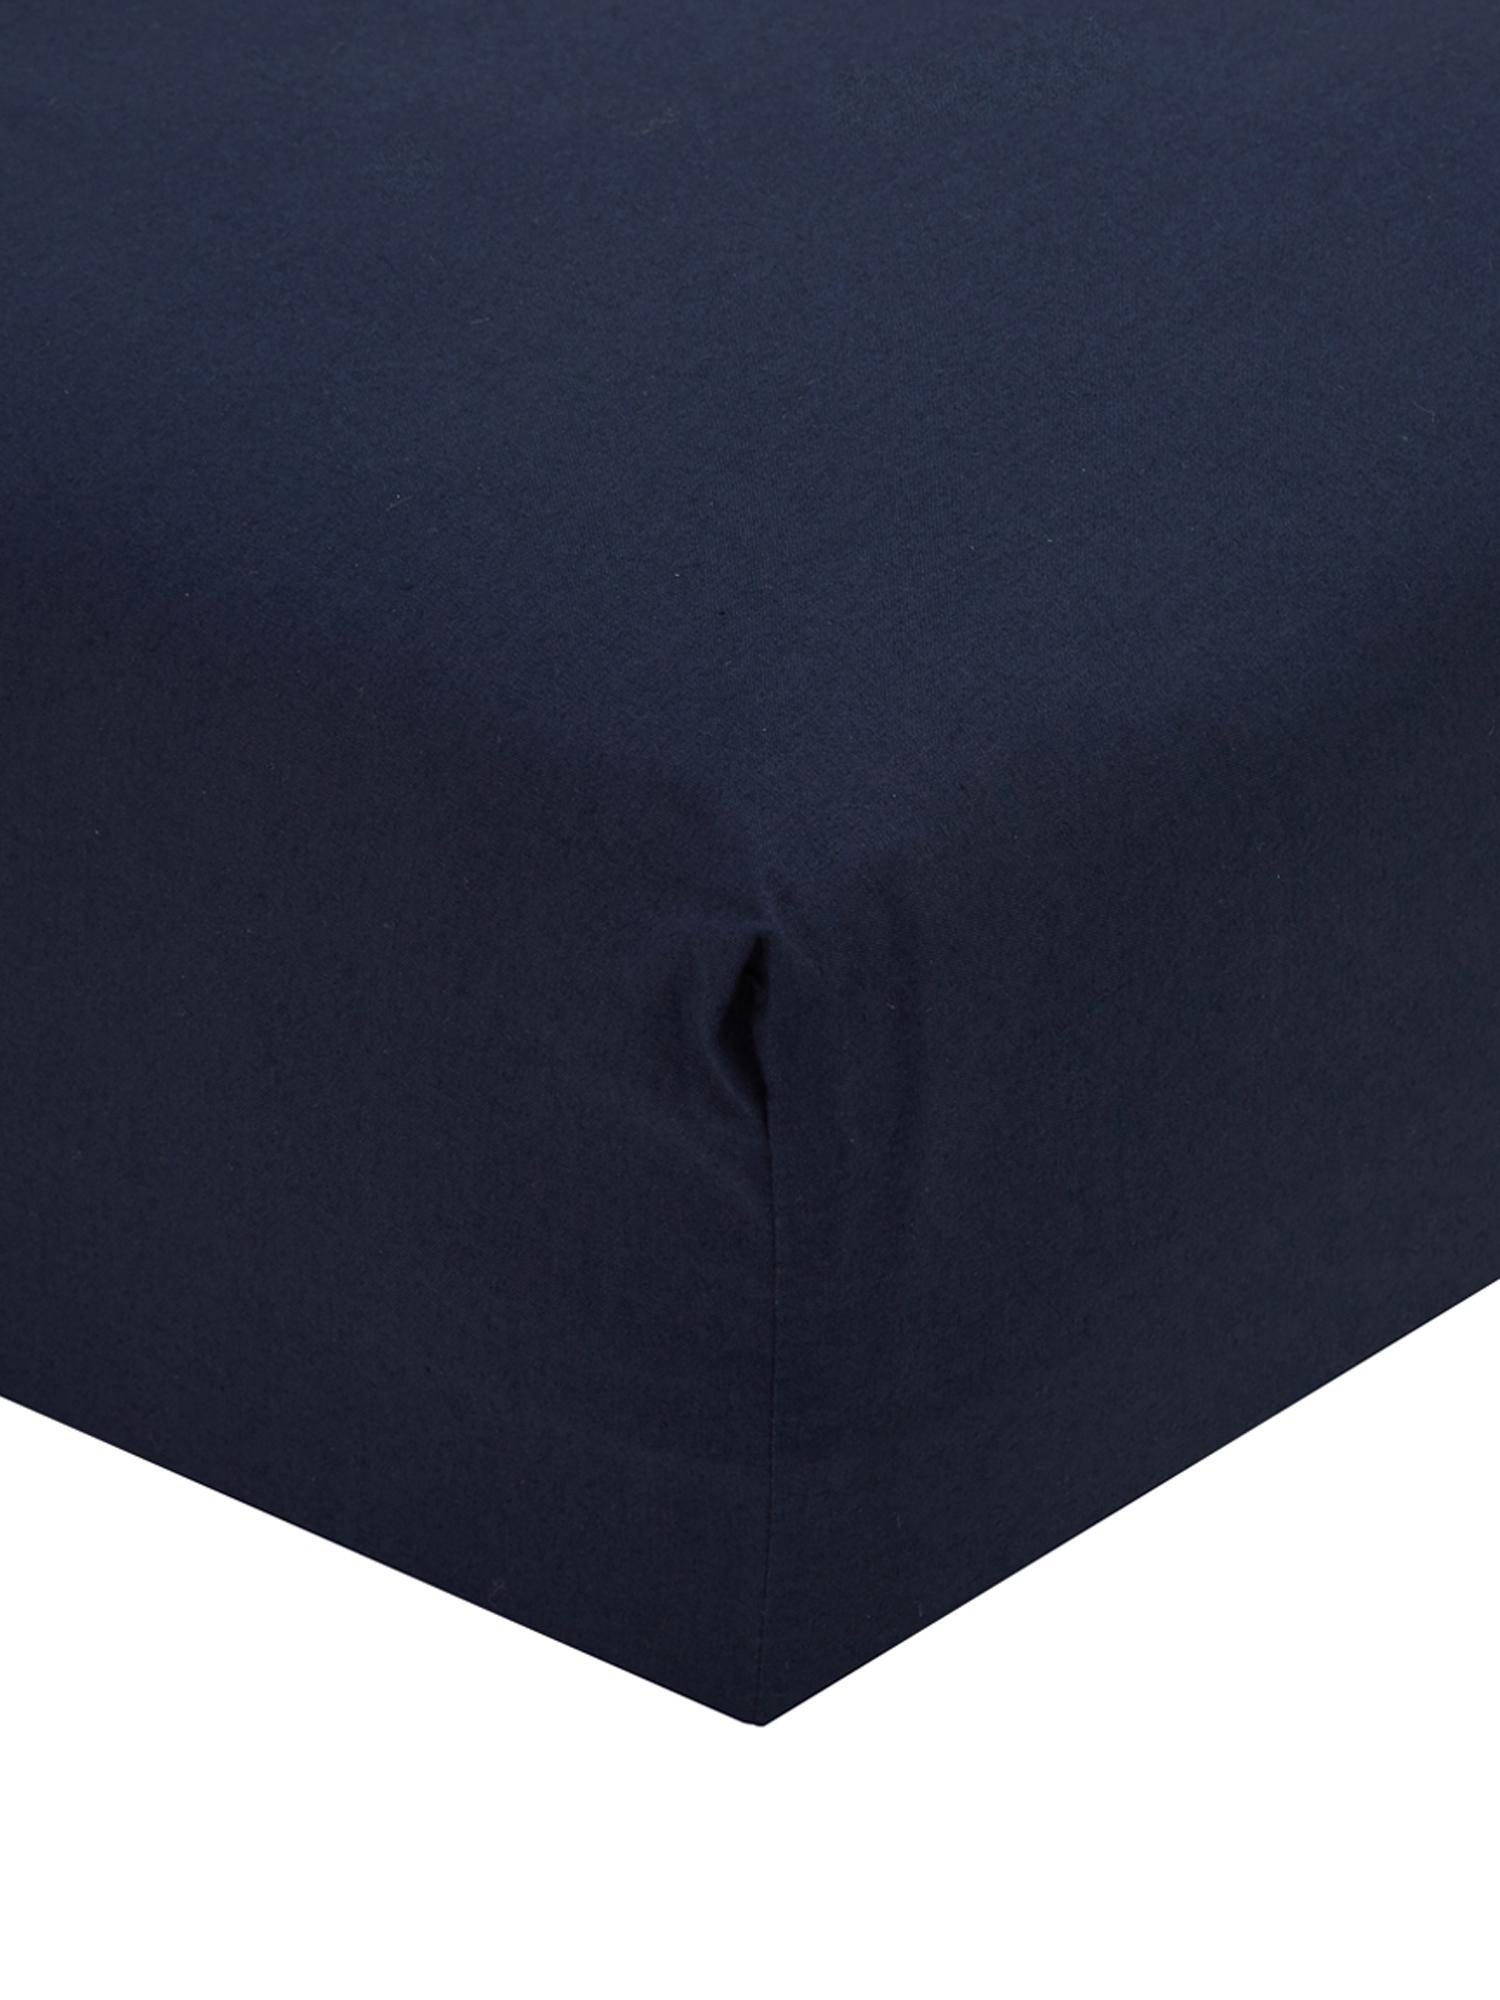 Perkal hoeslaken Elsie, Weeftechniek: perkal, Donkerblauw, 90 x 200 cm